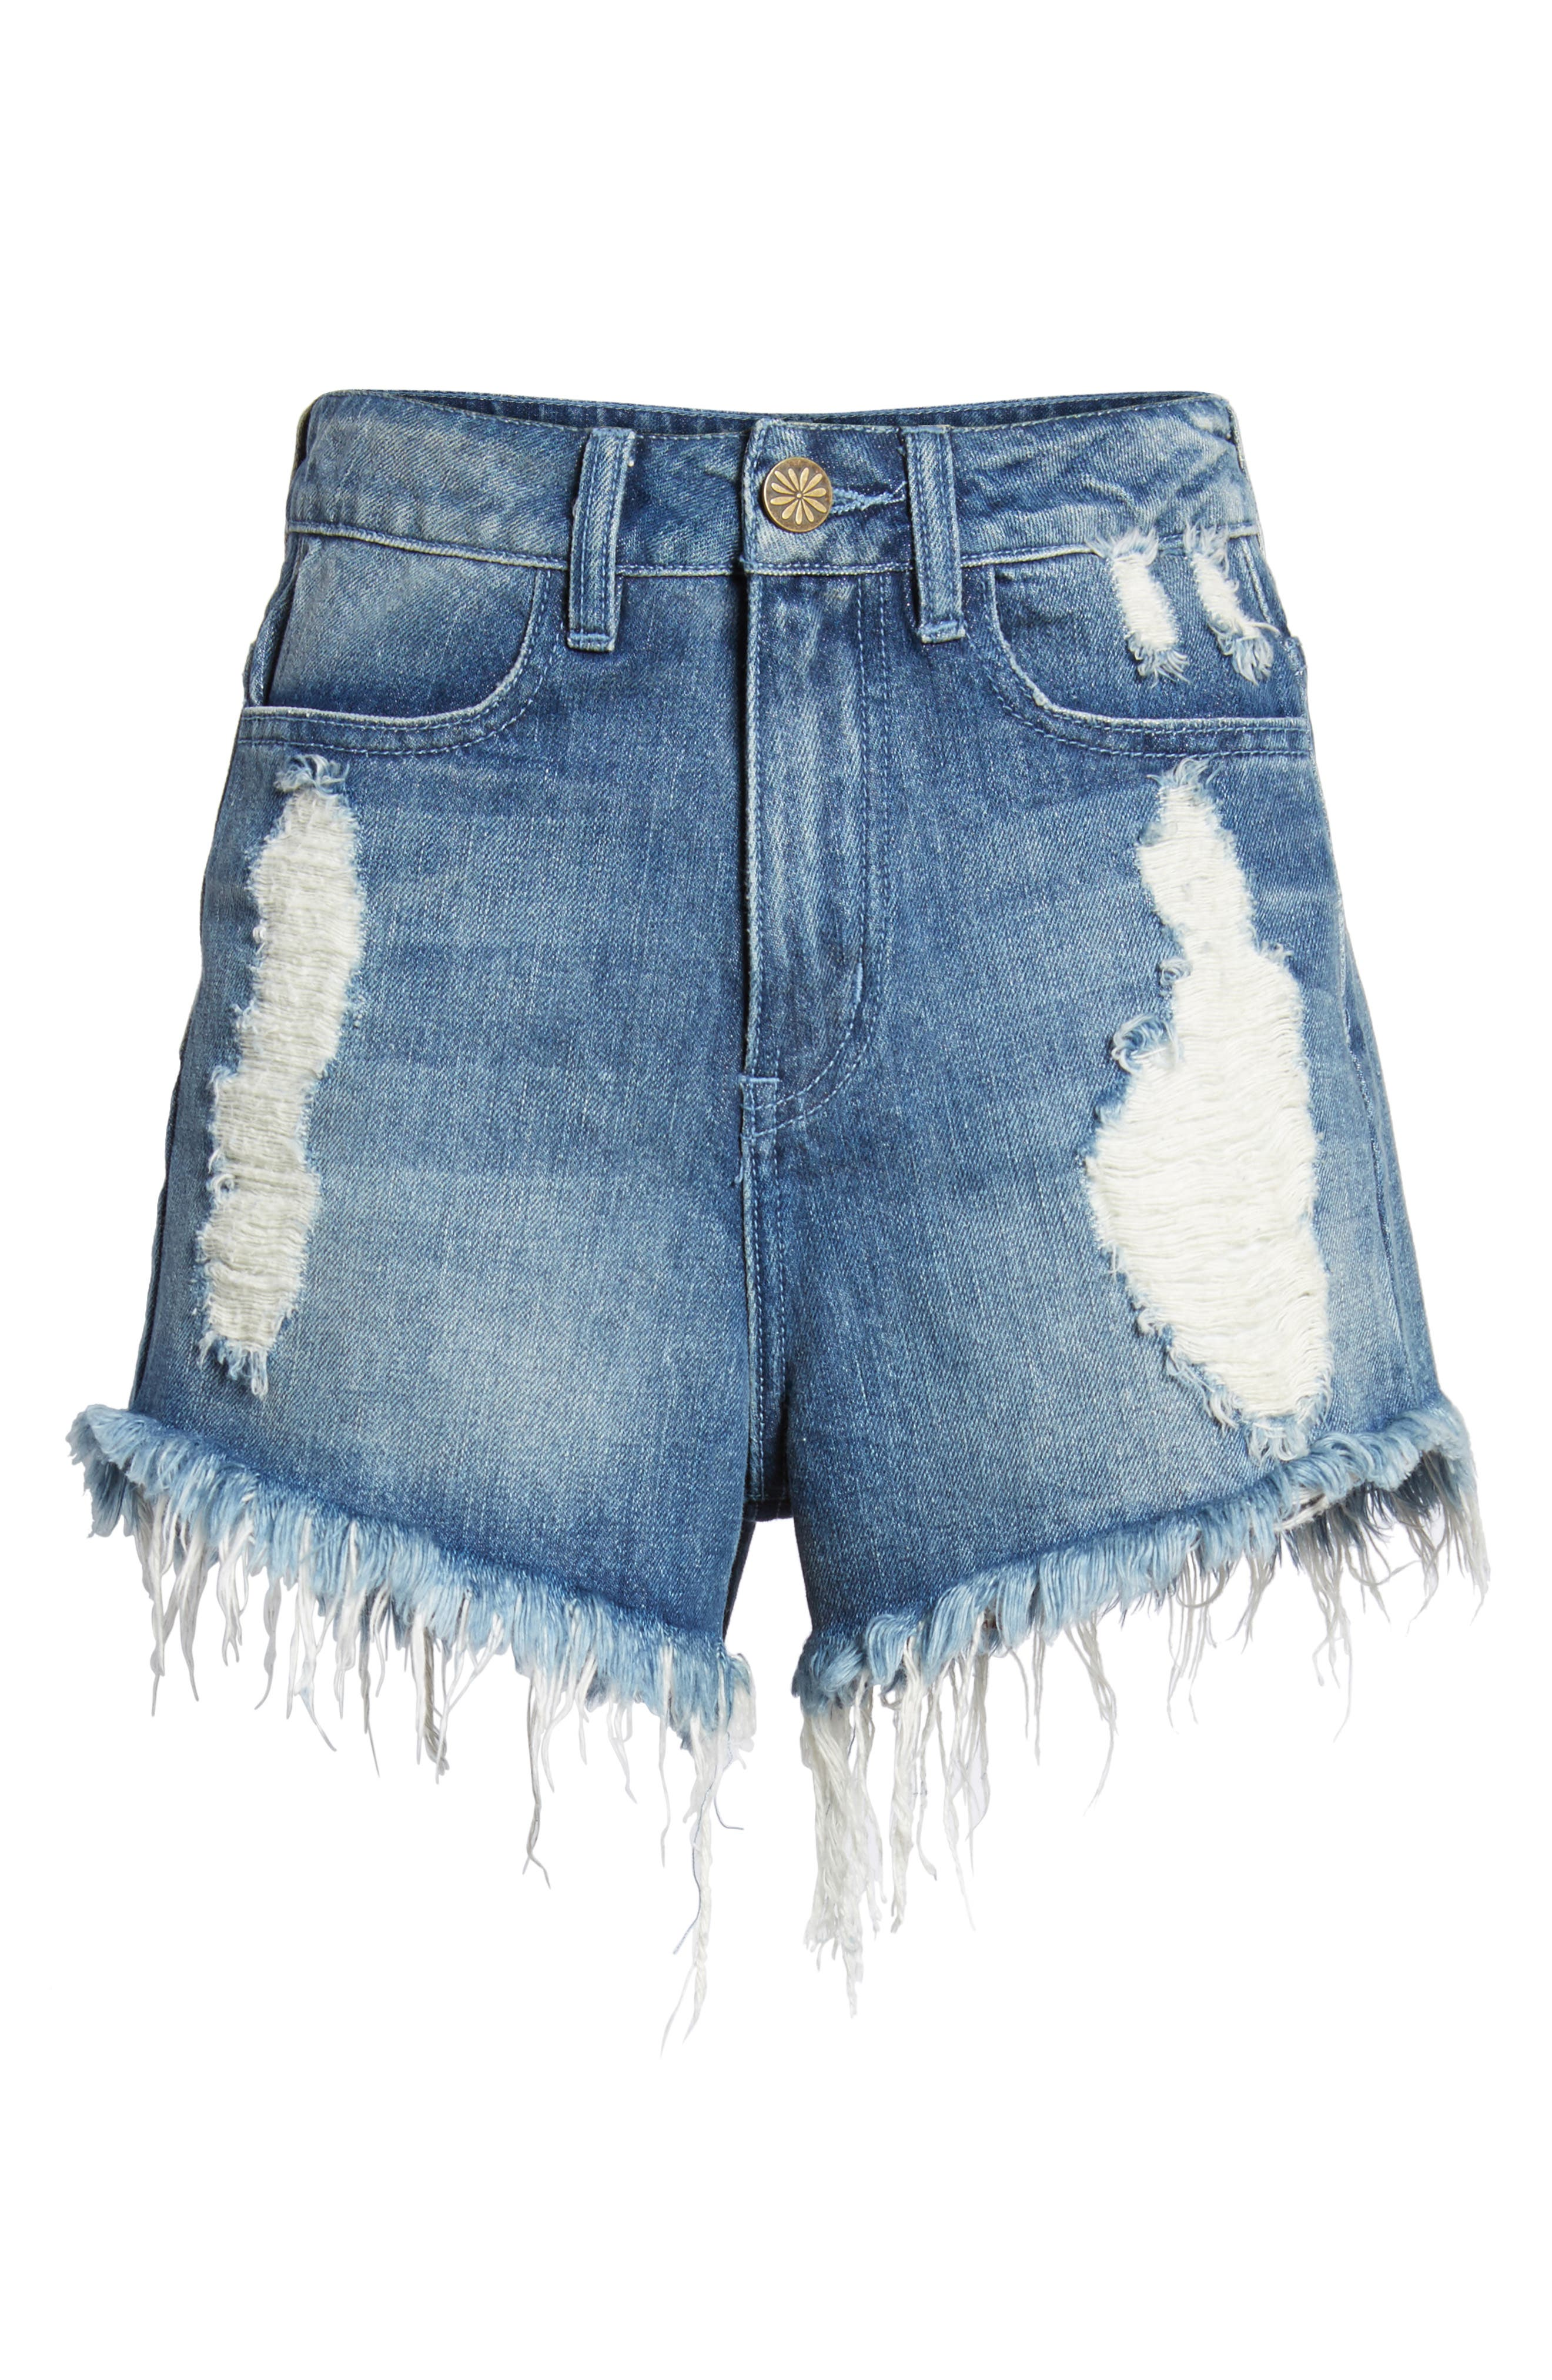 Wyoming High Waist Cutoff Denim Shorts,                             Alternate thumbnail 6, color,                             400